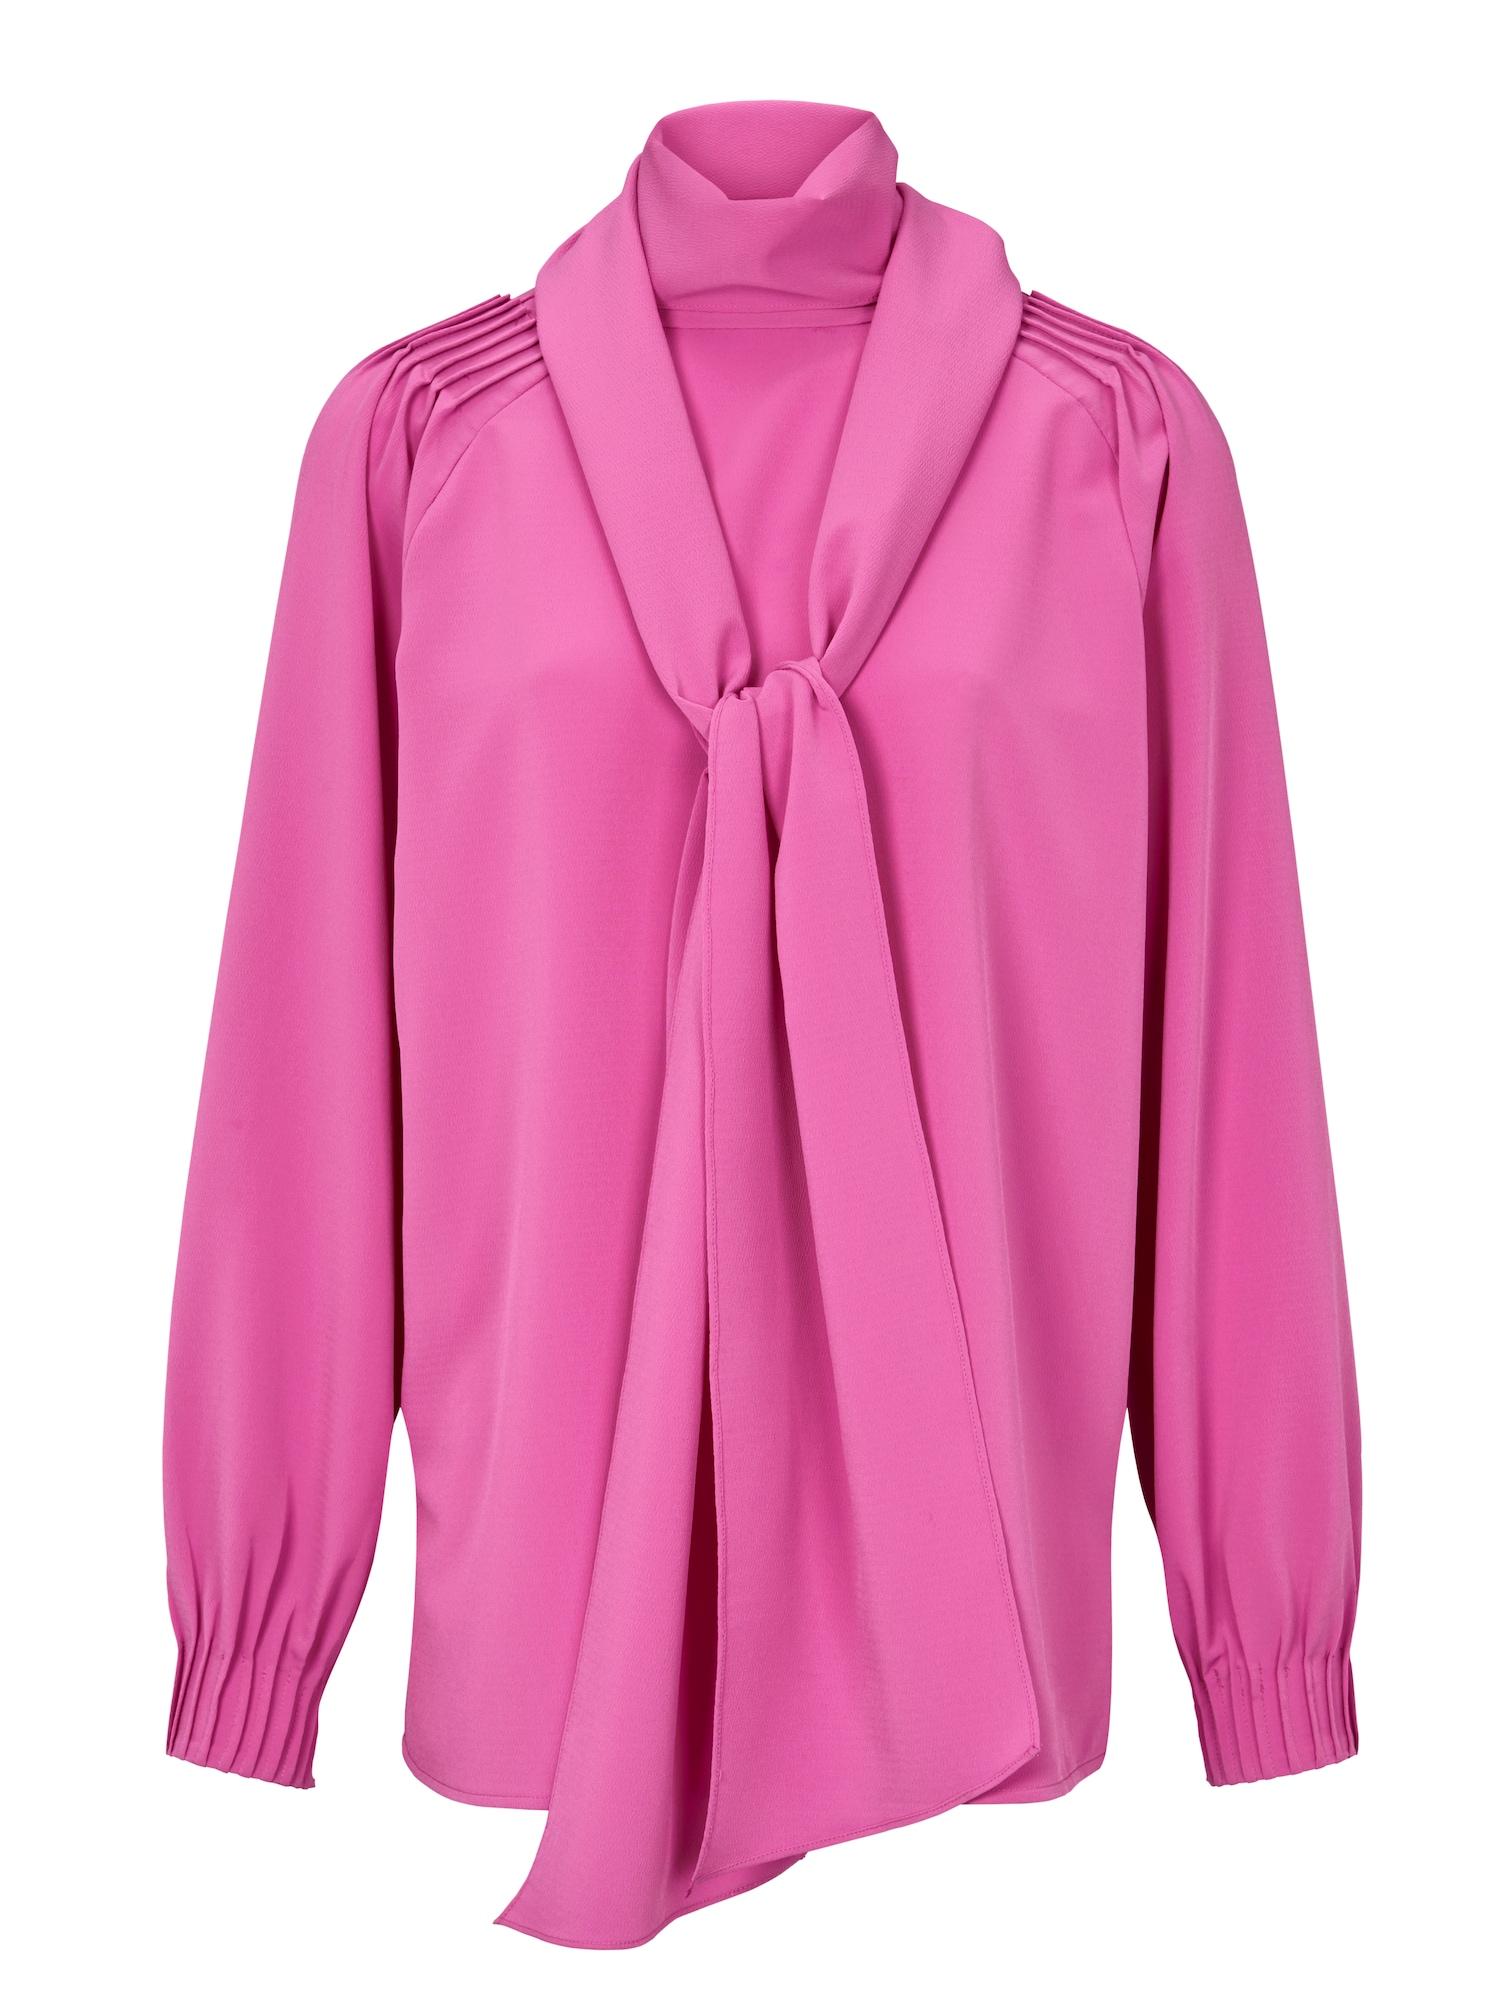 Halenka pink Heine